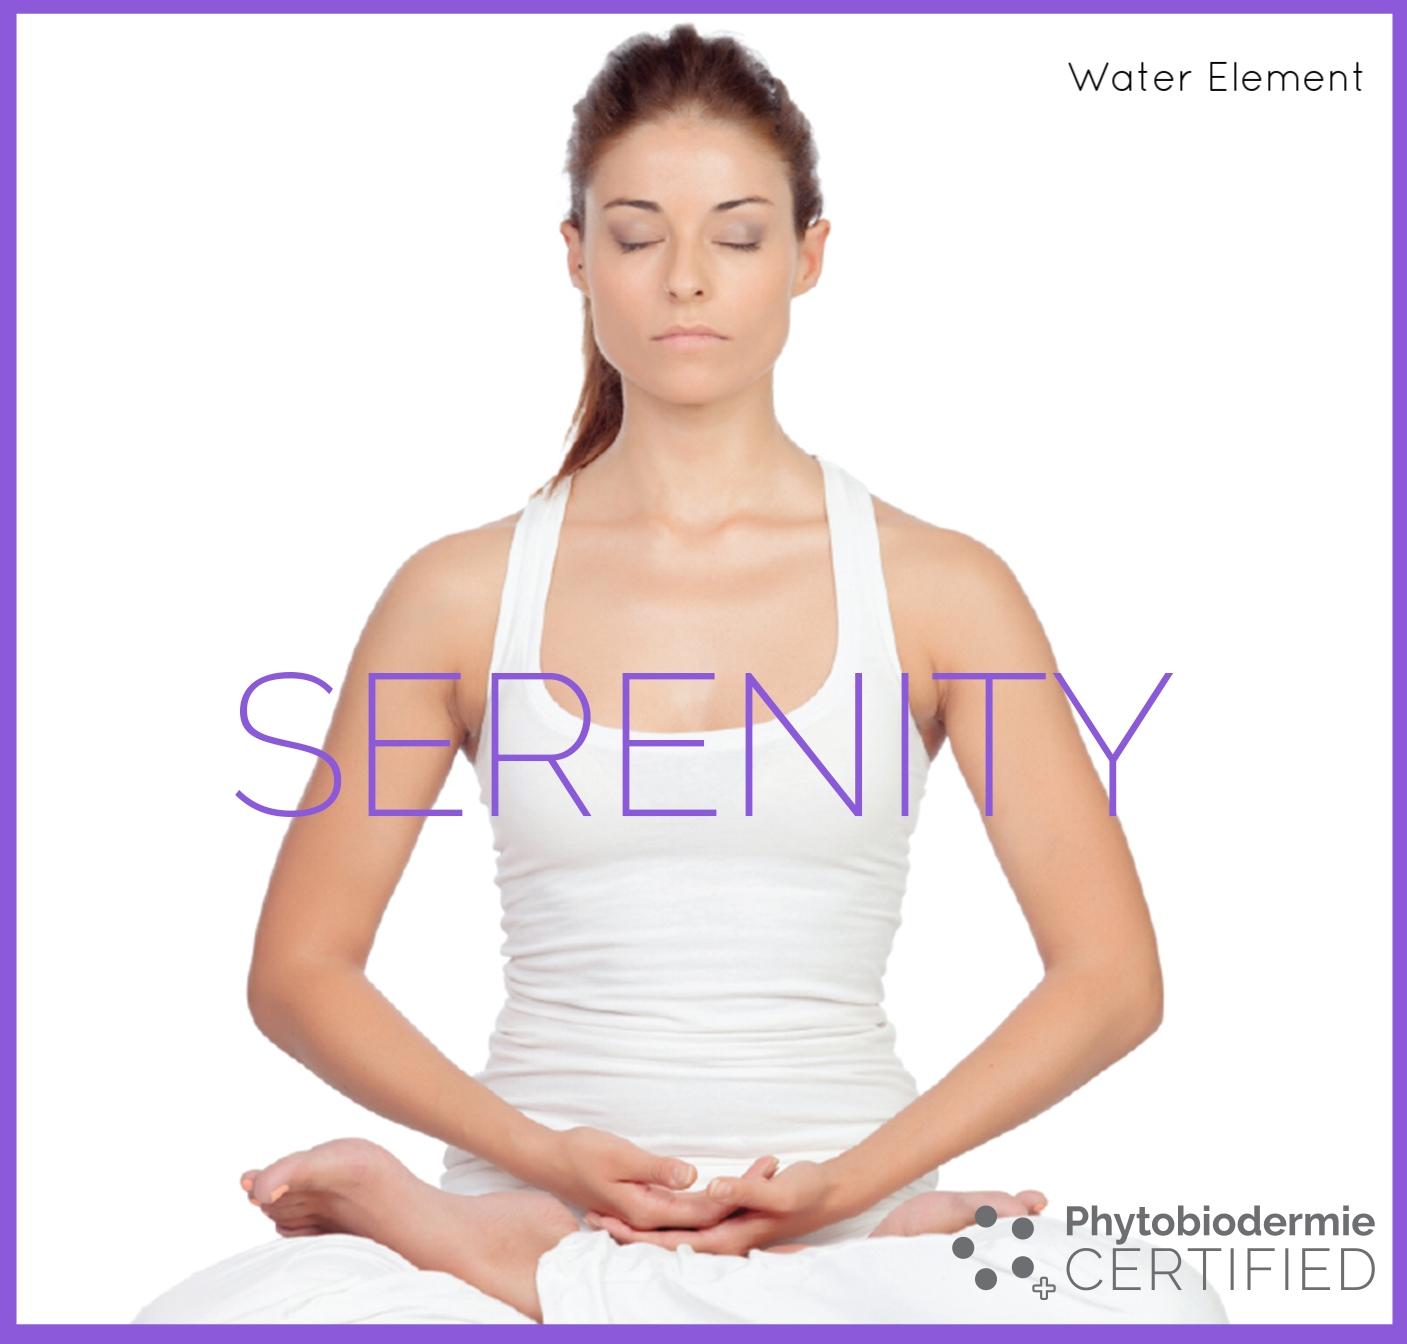 serenity_3 copy.jpg